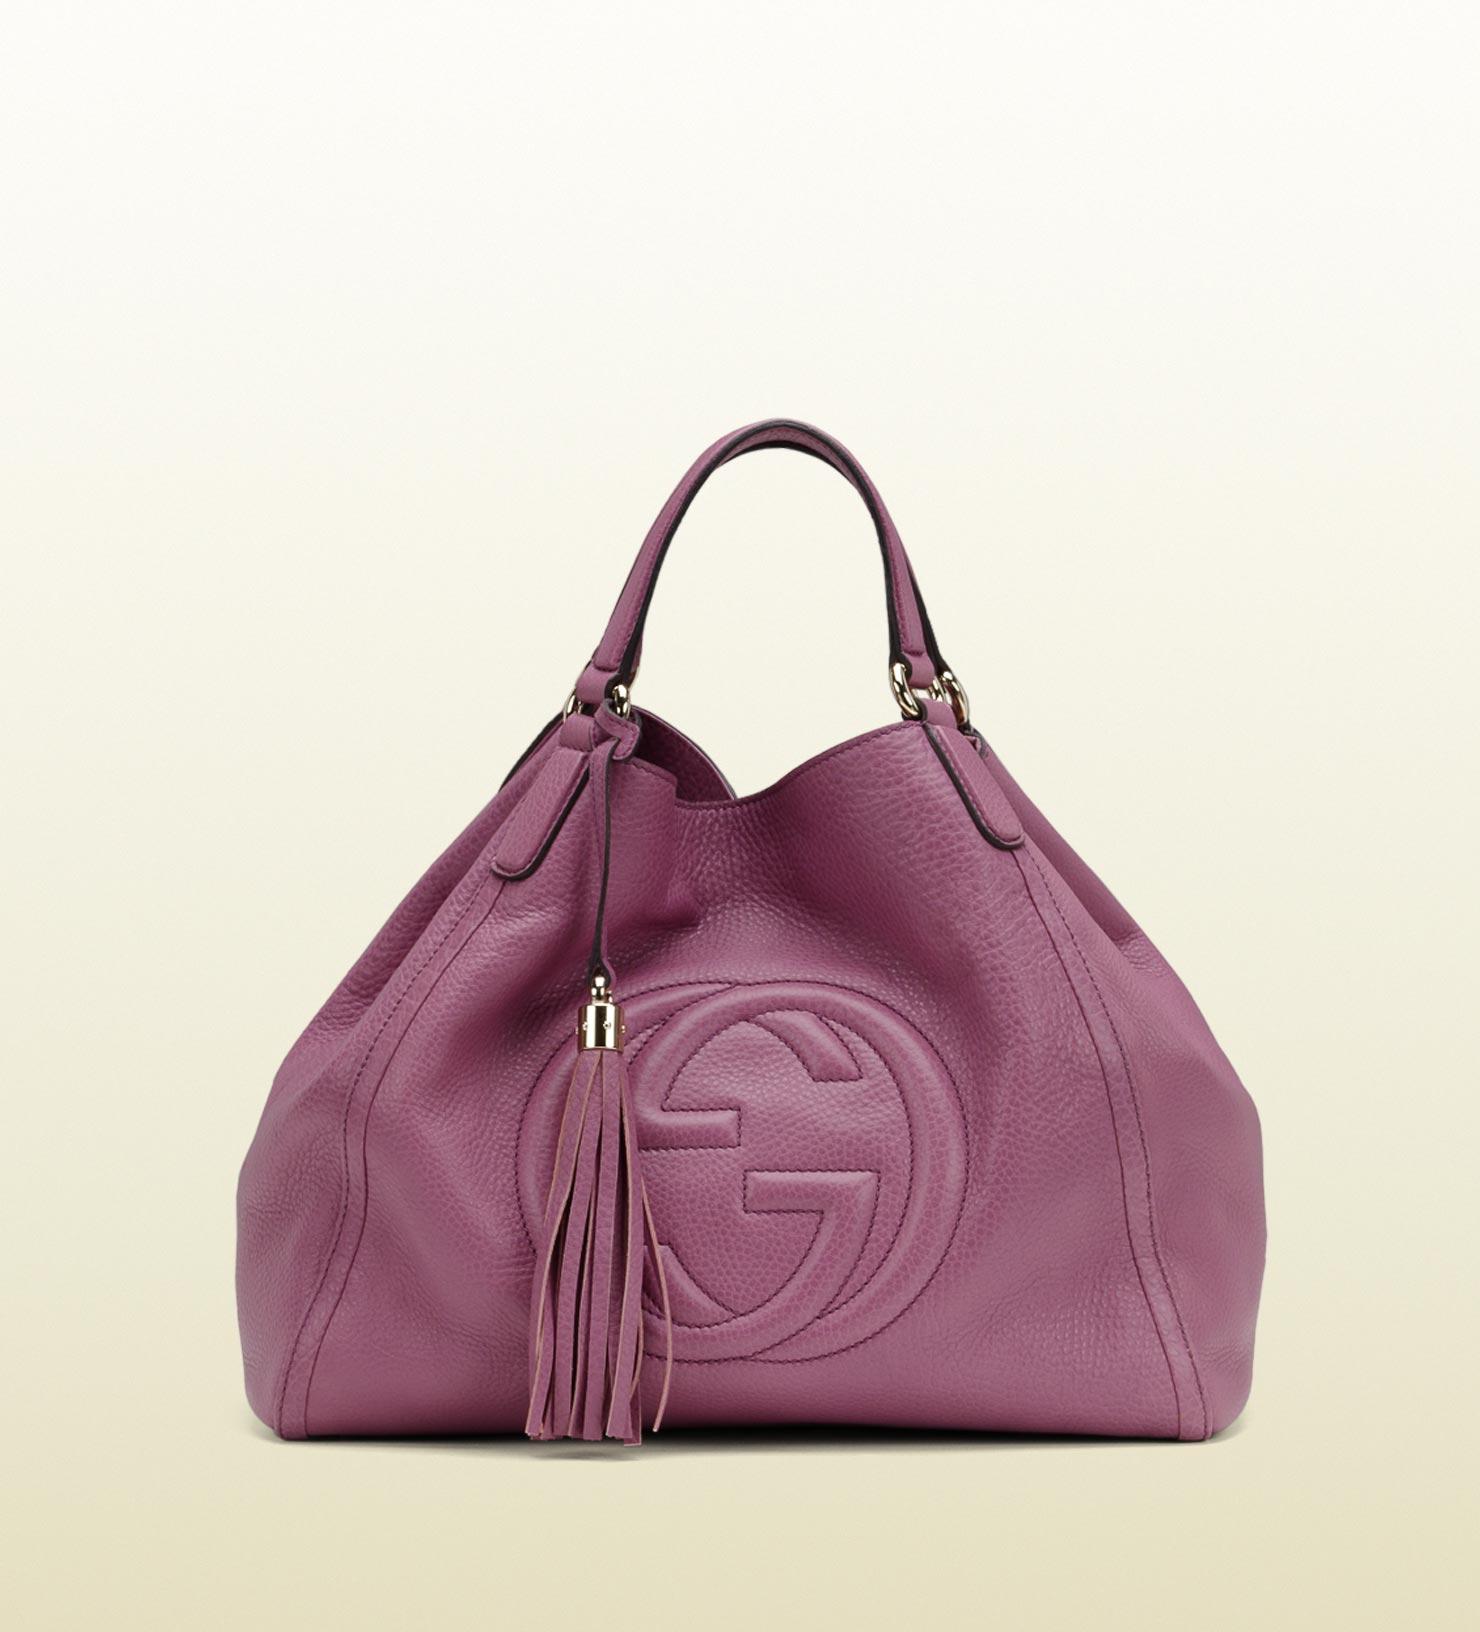 Lyst - Gucci Soho Light Sunflower Leather Shoulder Bag in Pink